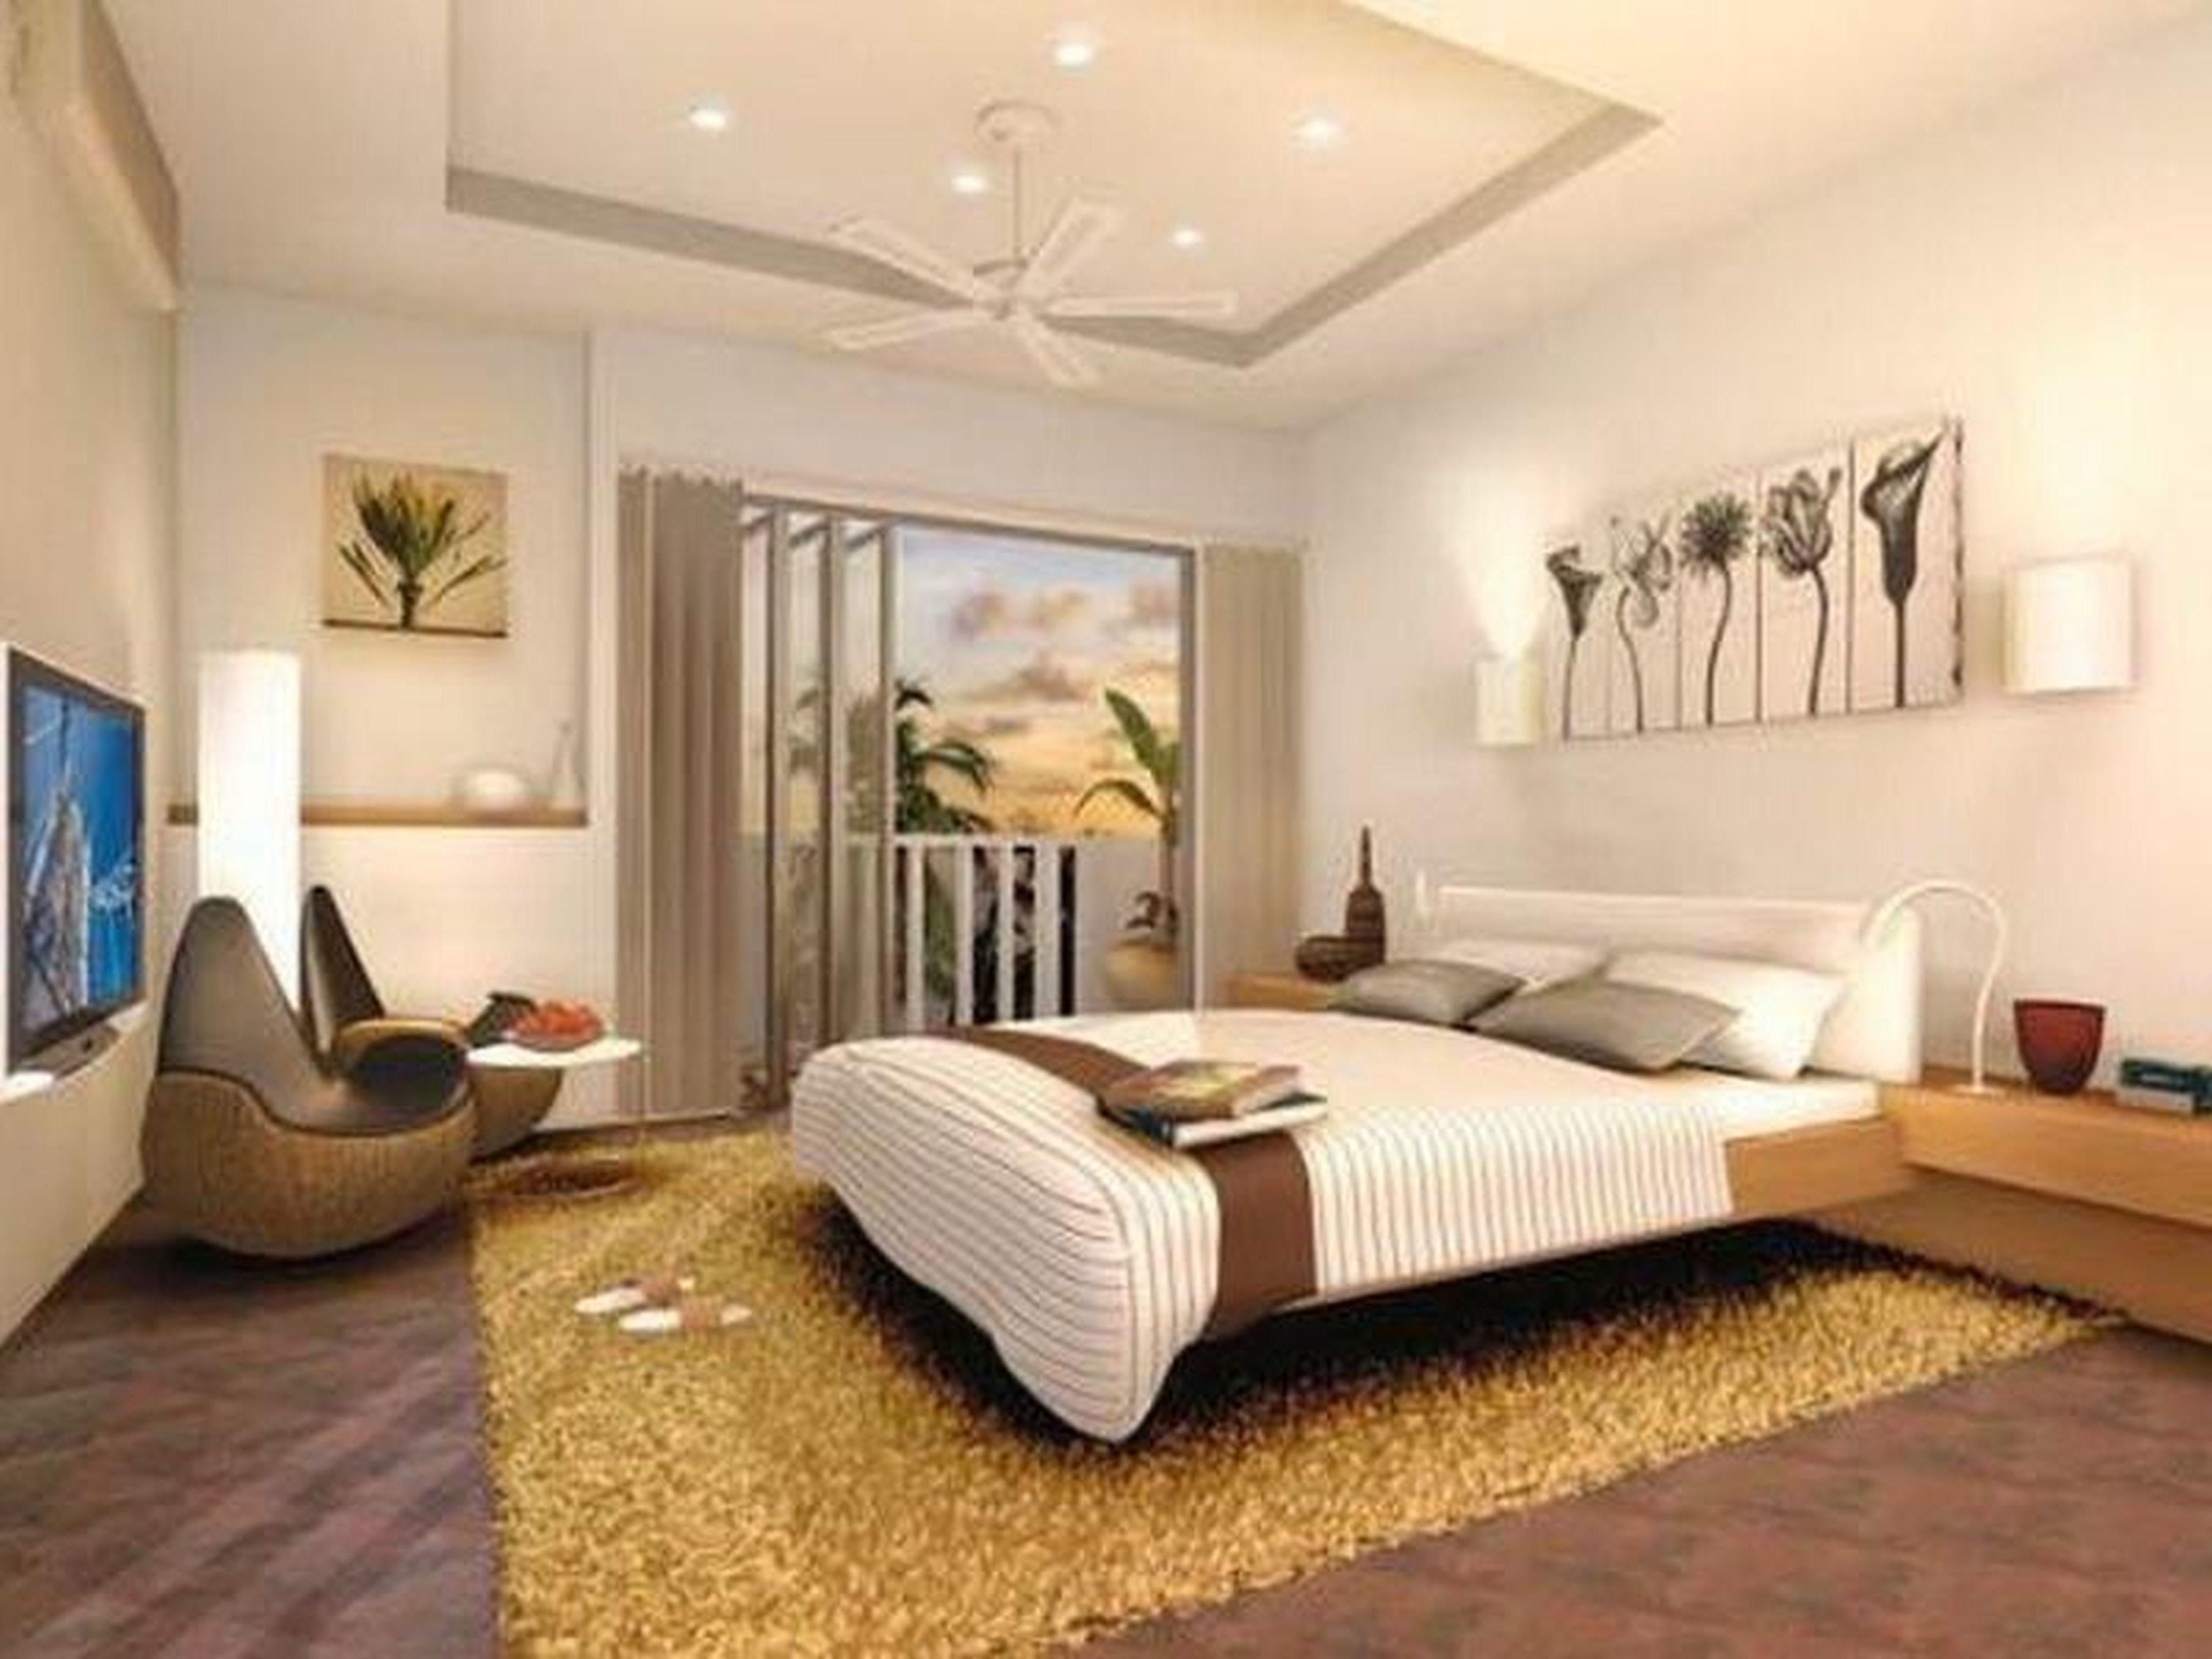 Home Decor Bedrooms Bedroom Adorable Home Decor Bedroom